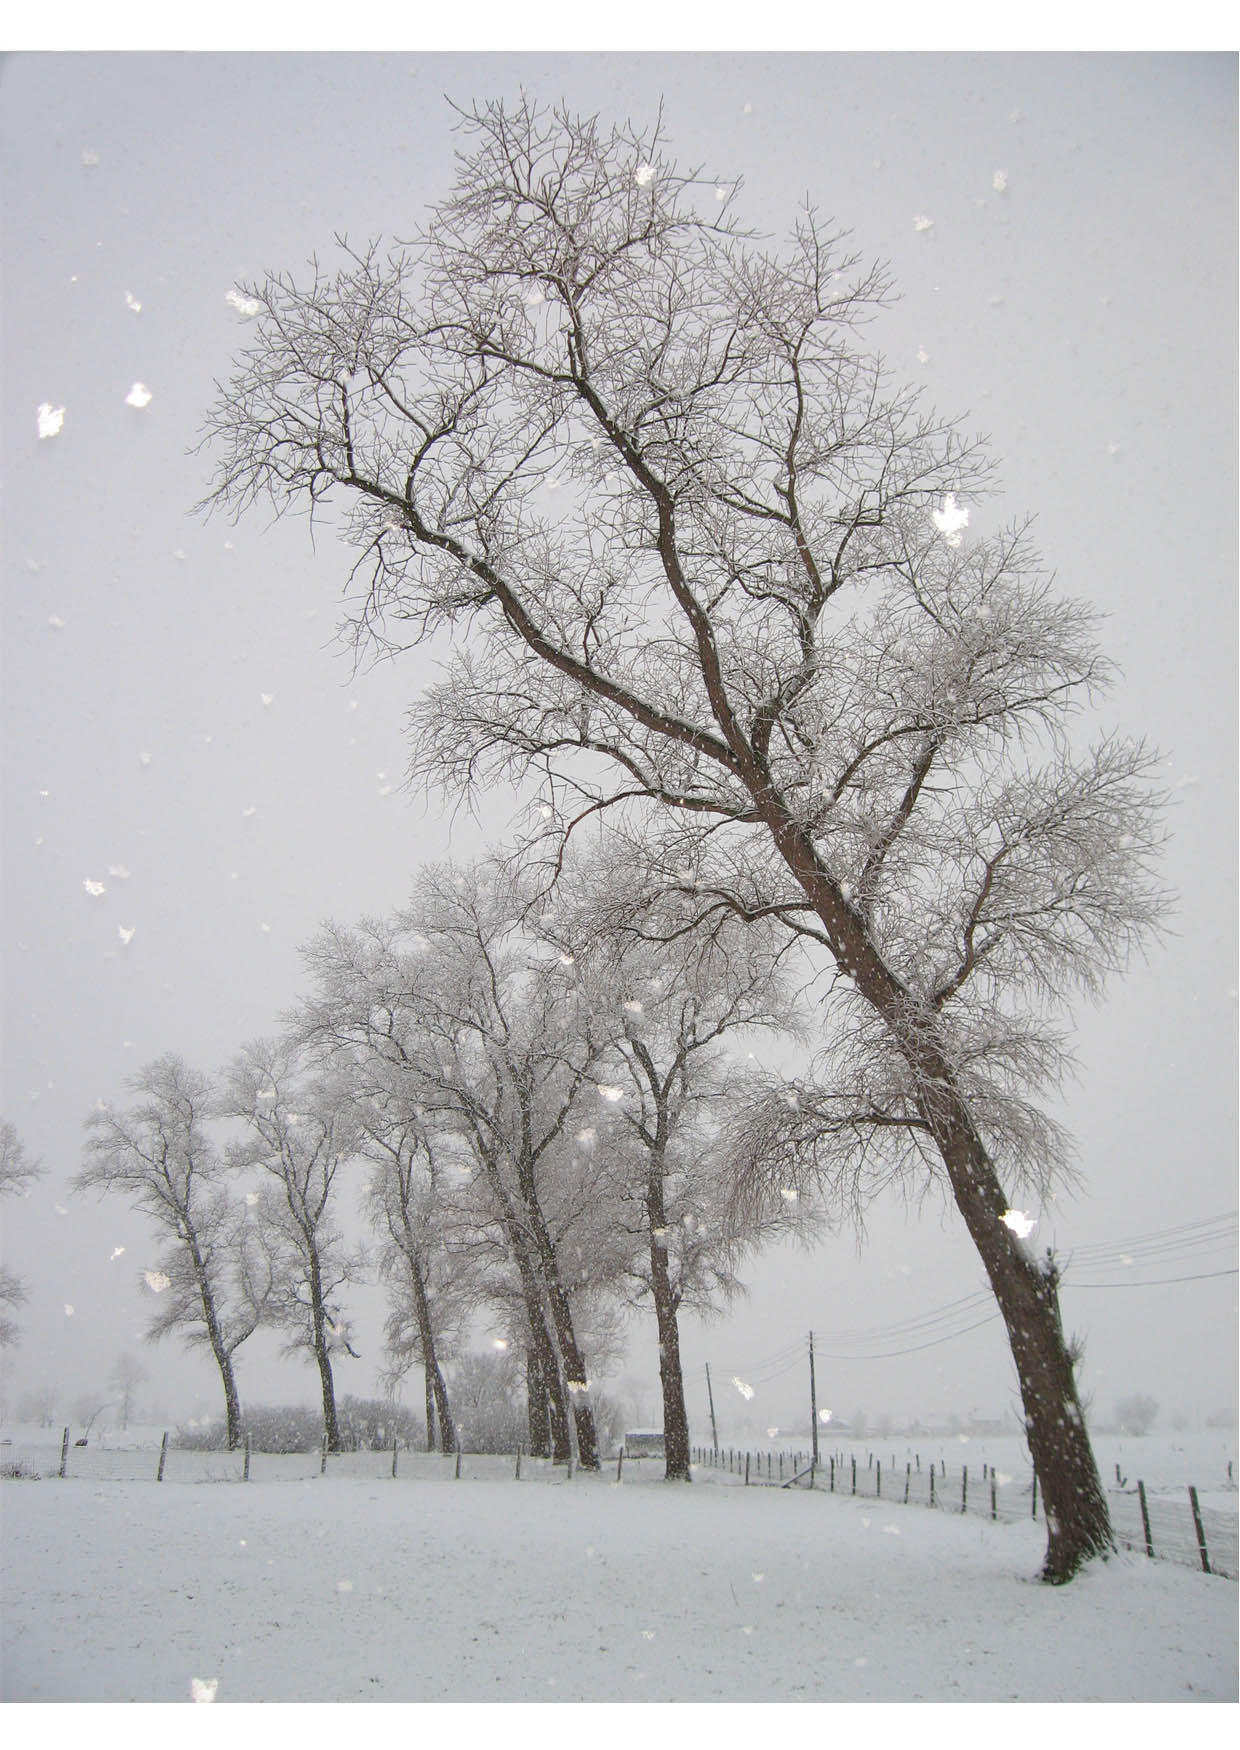 Photo neige paysage enneig img 9128 - Paysage enneige dessin ...